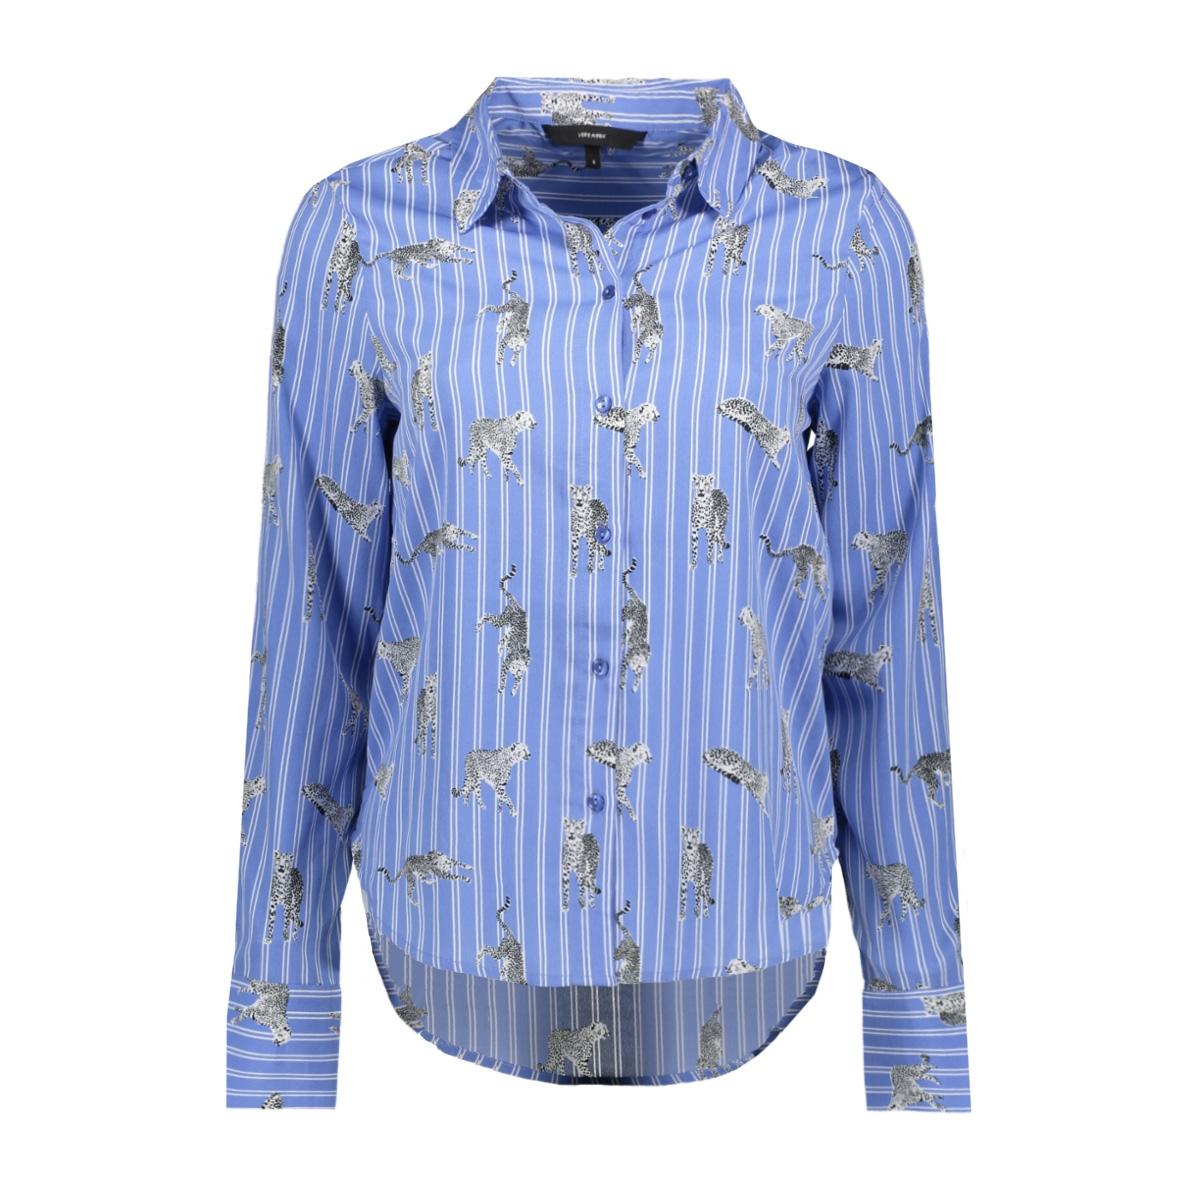 vmnicky l/s shirt d2-1 10193878 vero moda blouse granada sky